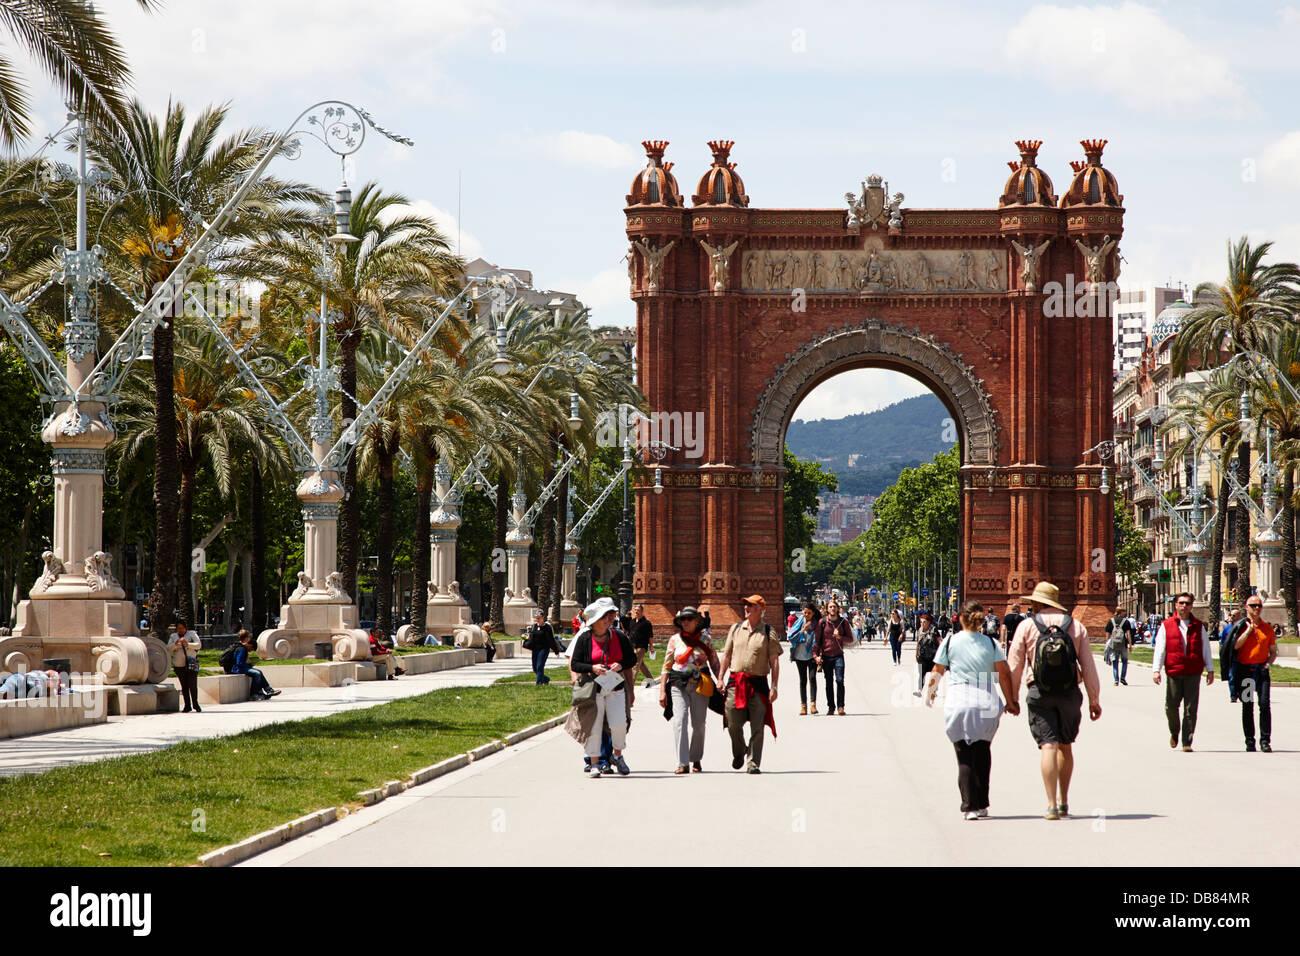 arc de triomf on Passeig de Lluis companys promenade Barcelona Catalonia Spain - Stock Image